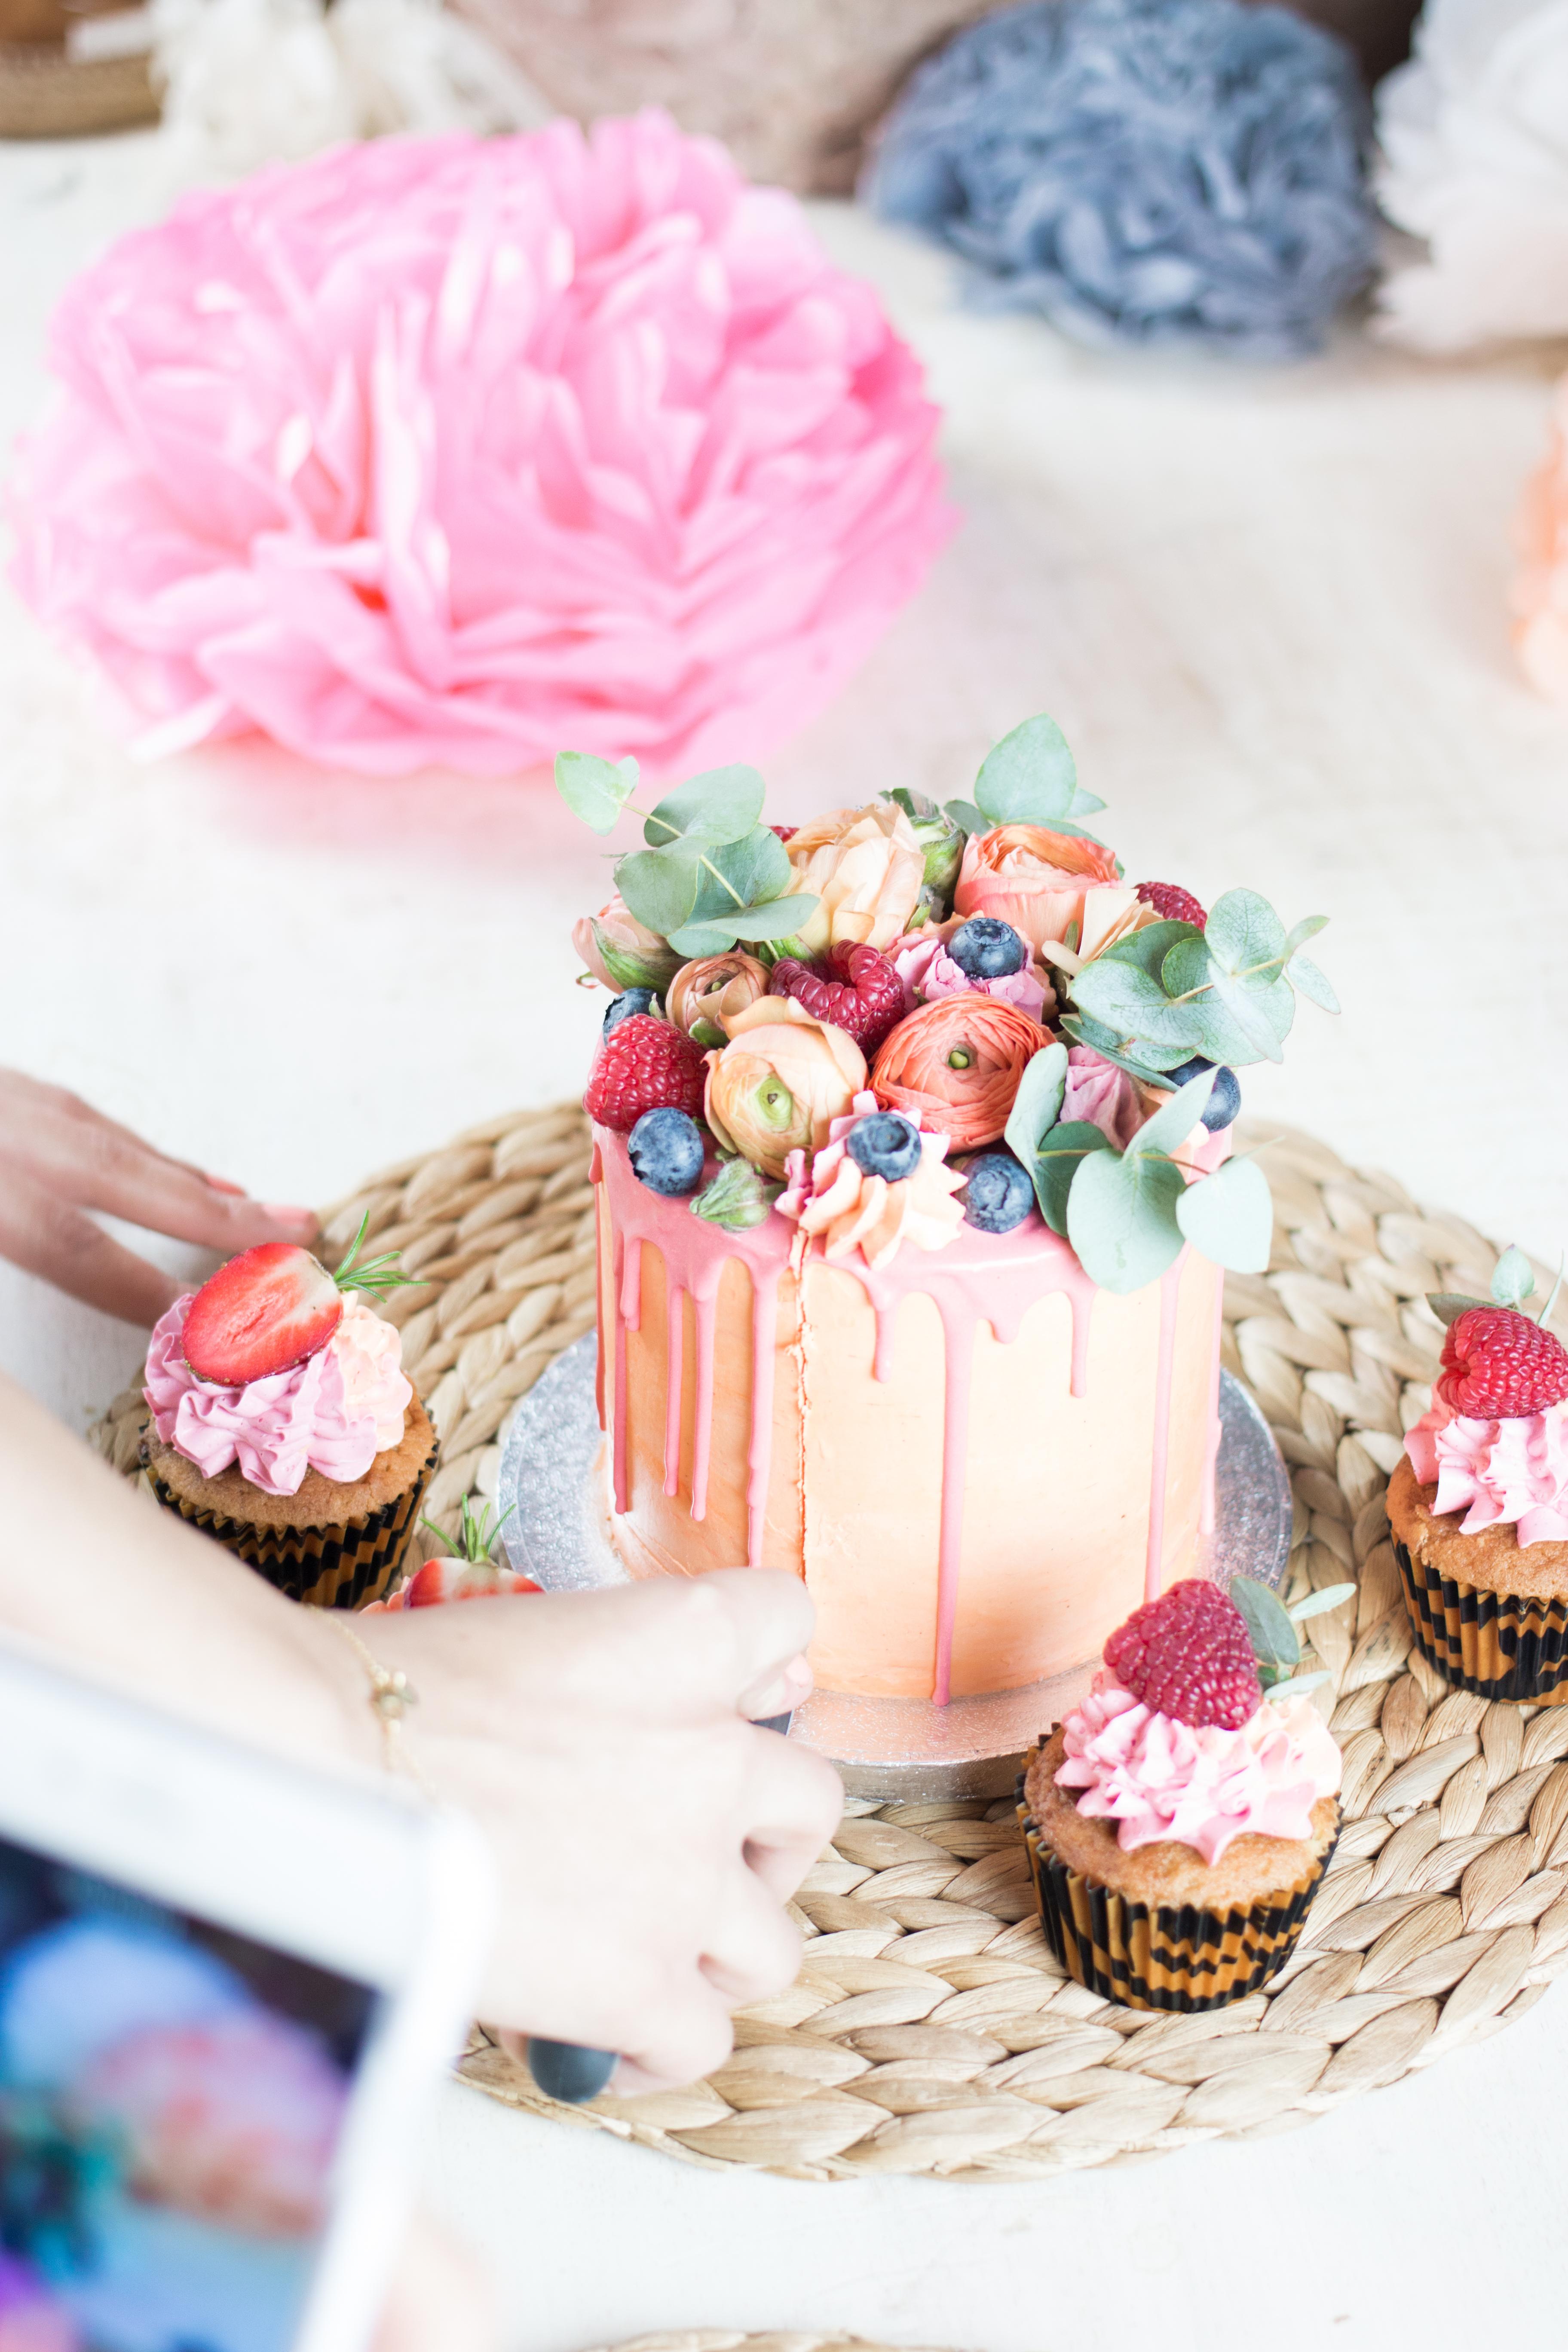 Decoración: @madewithlof Cupcakes: @smilingcompany